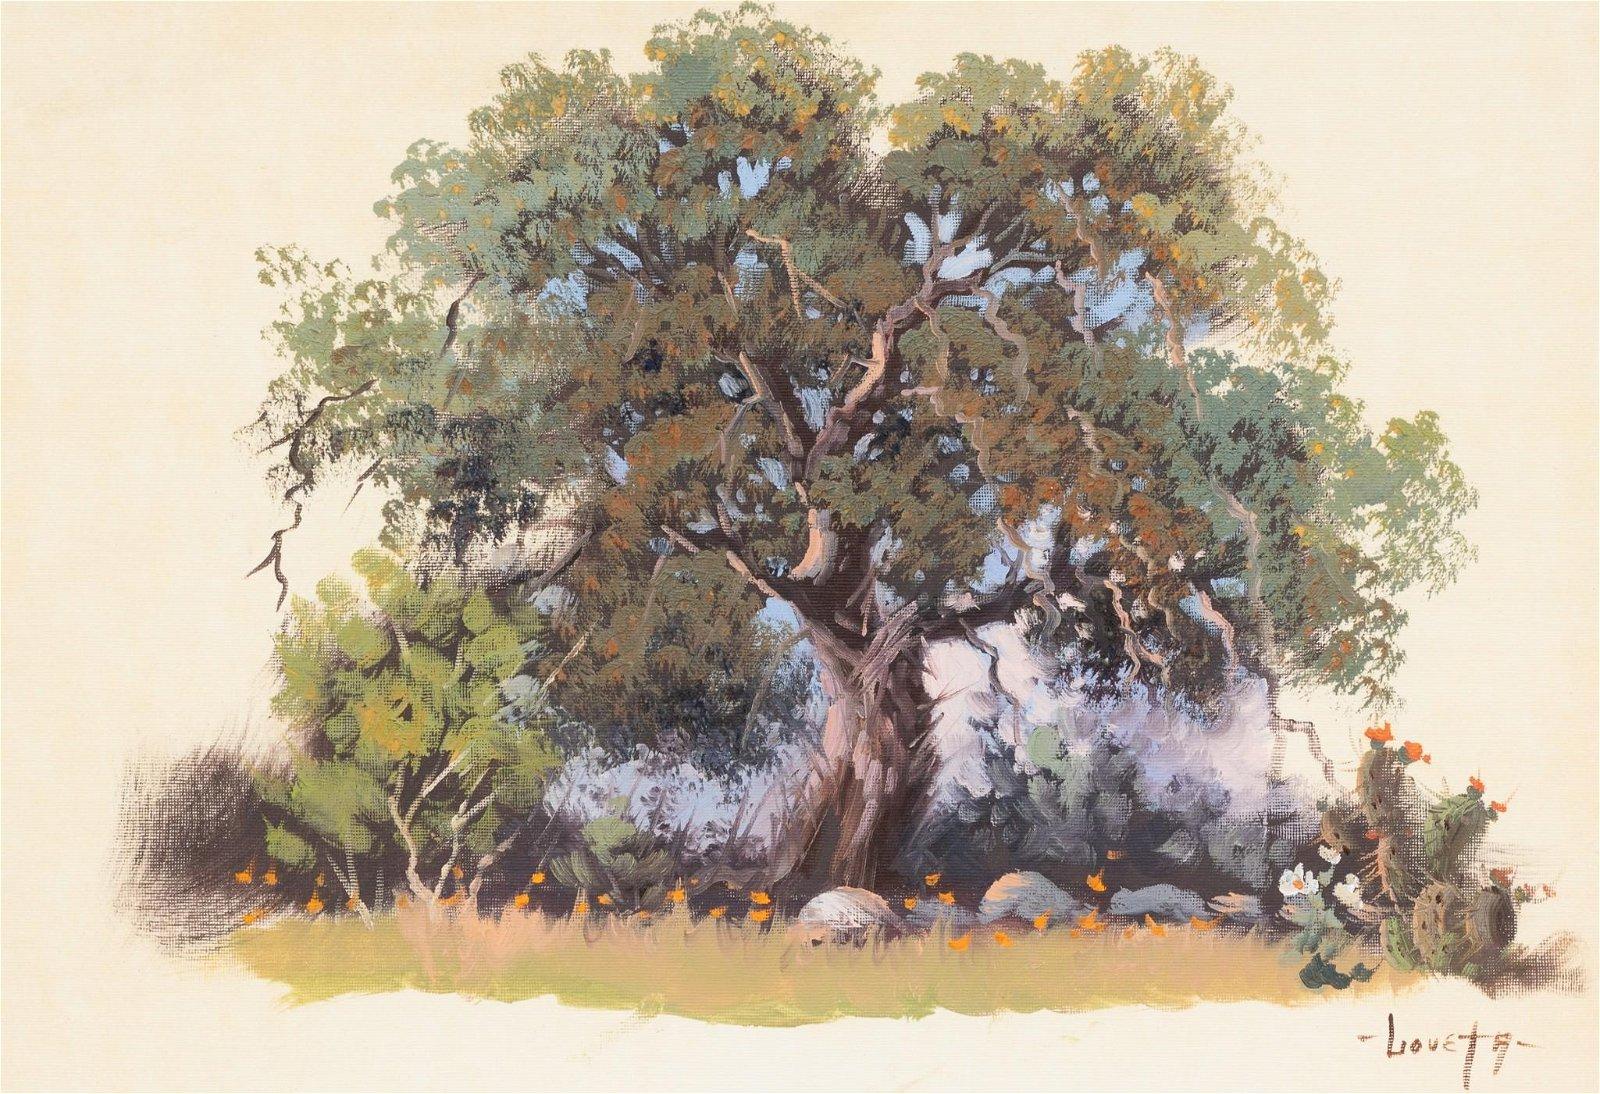 Loveta Strickland (b. 1928), Hill Country Live Oak, oil